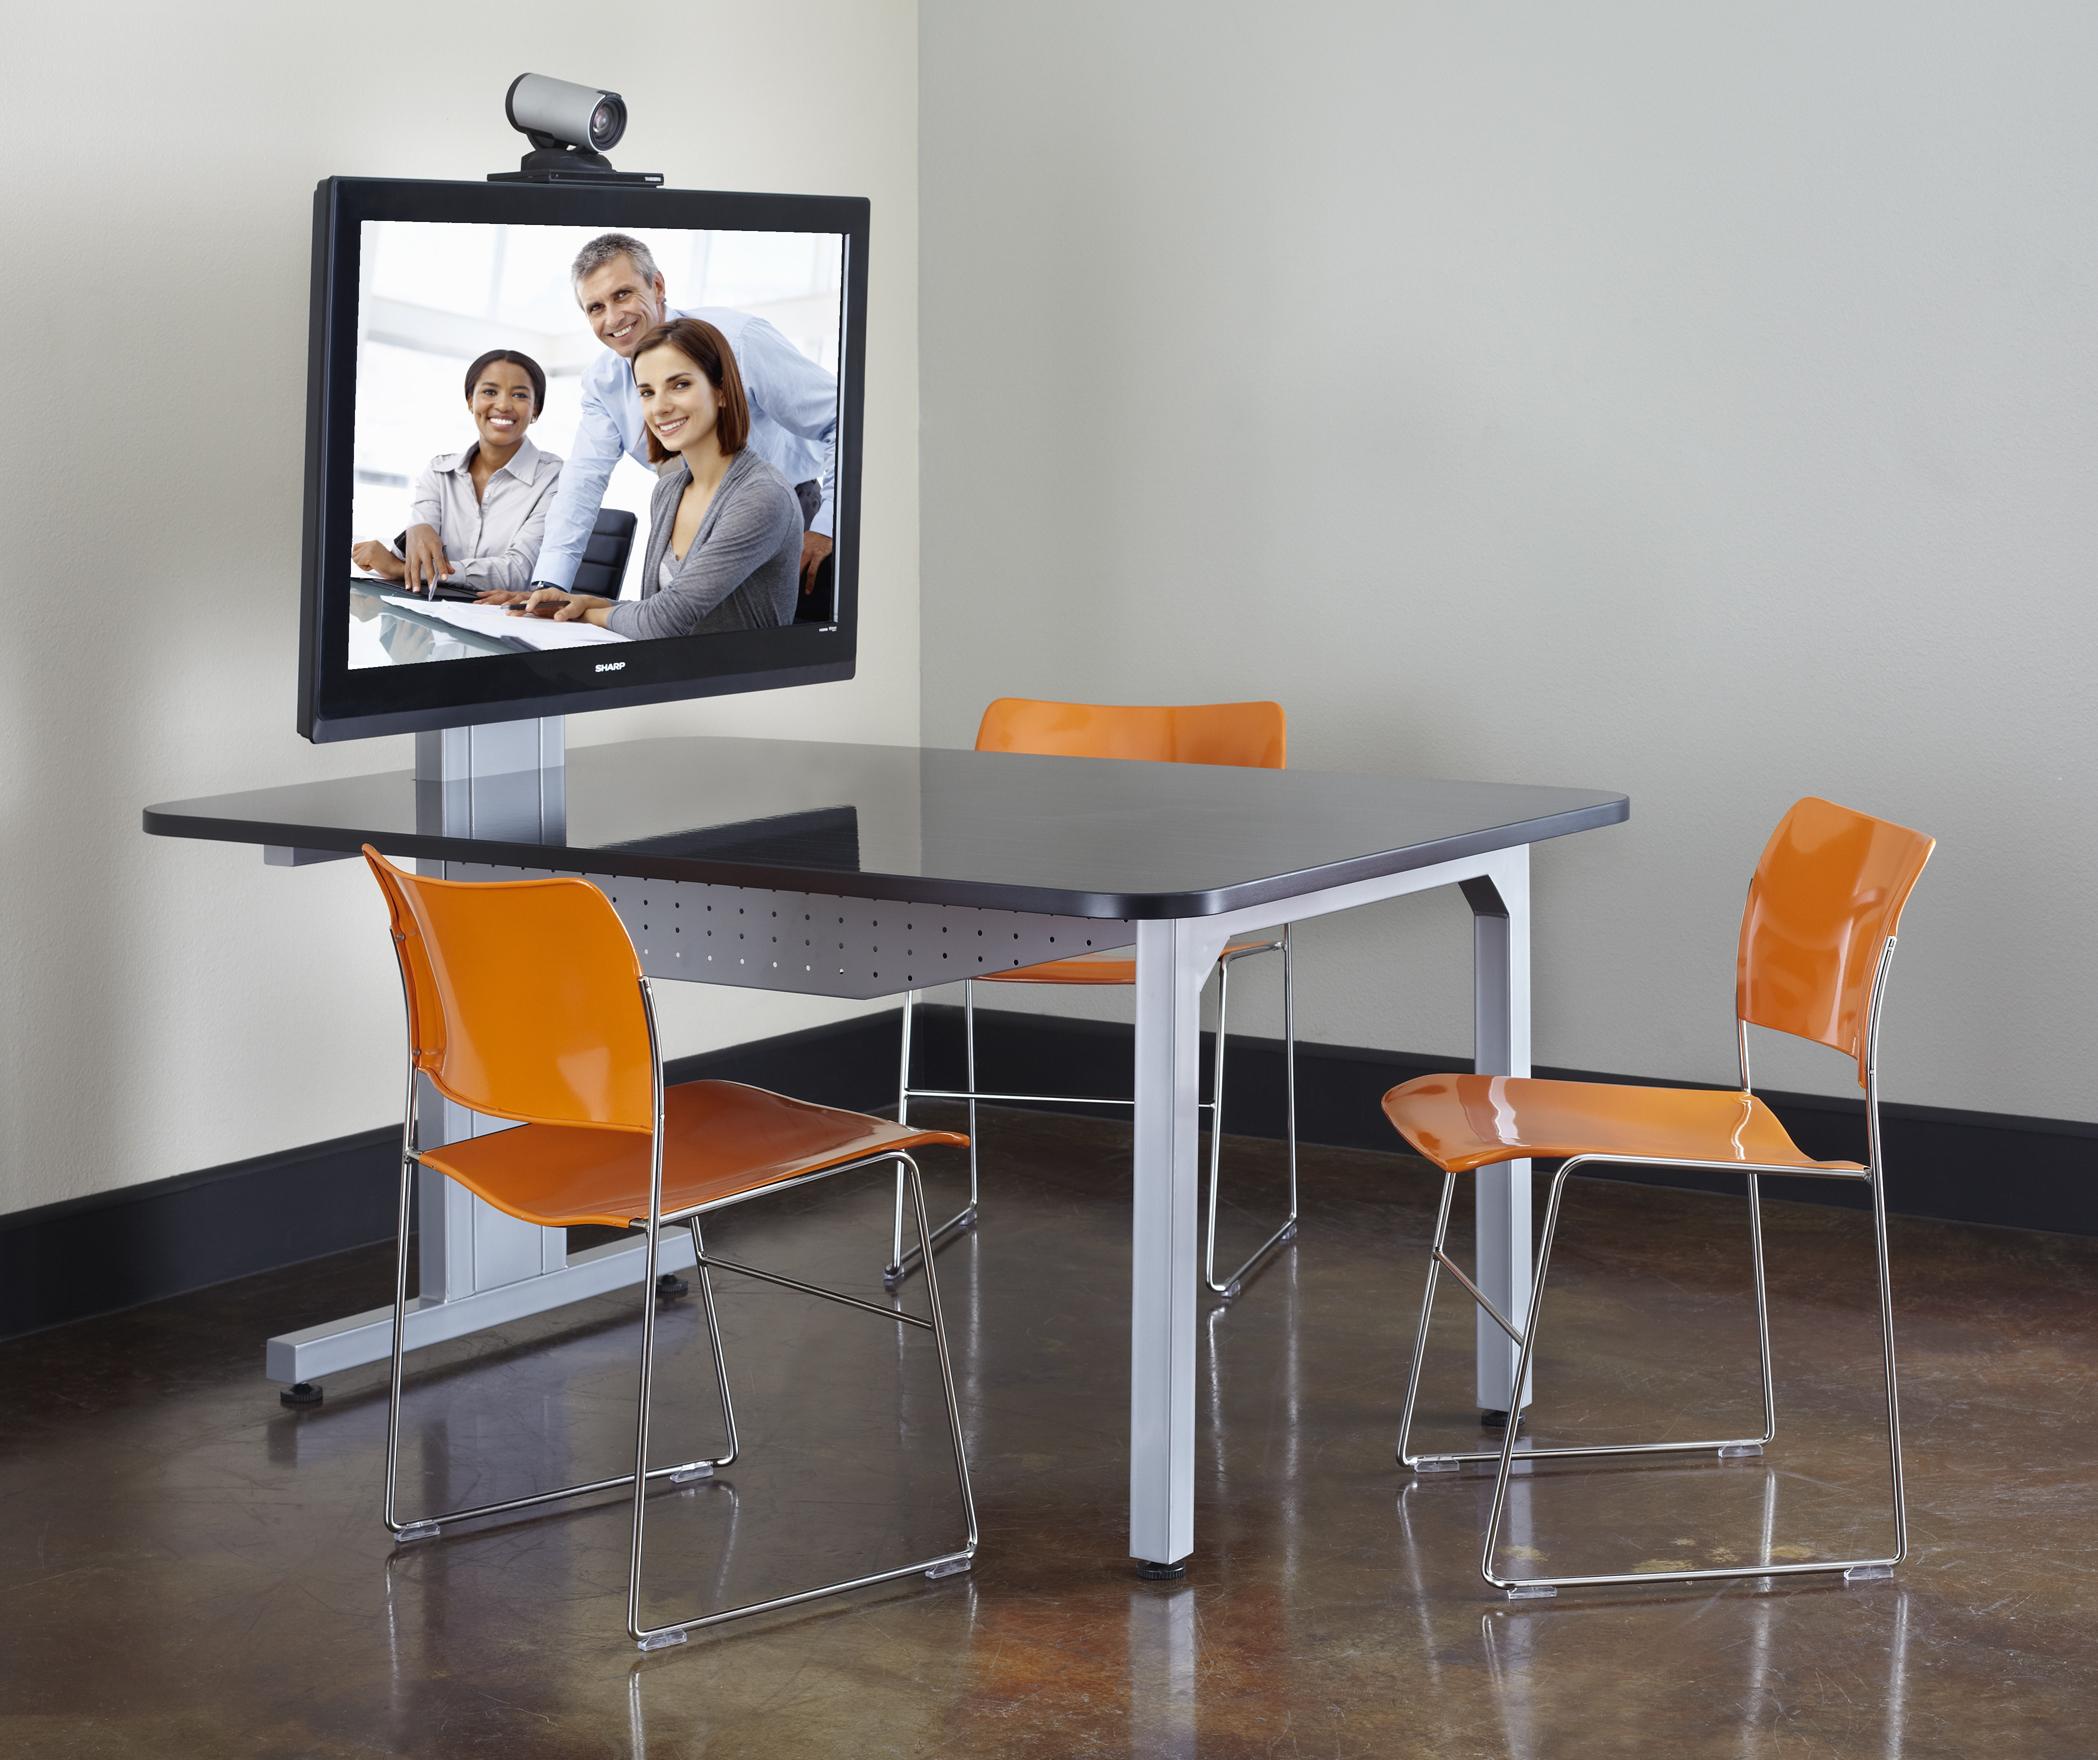 teamspace-eco-single-display-orange-chairs-tandberg-angle-screen-shot.jpg